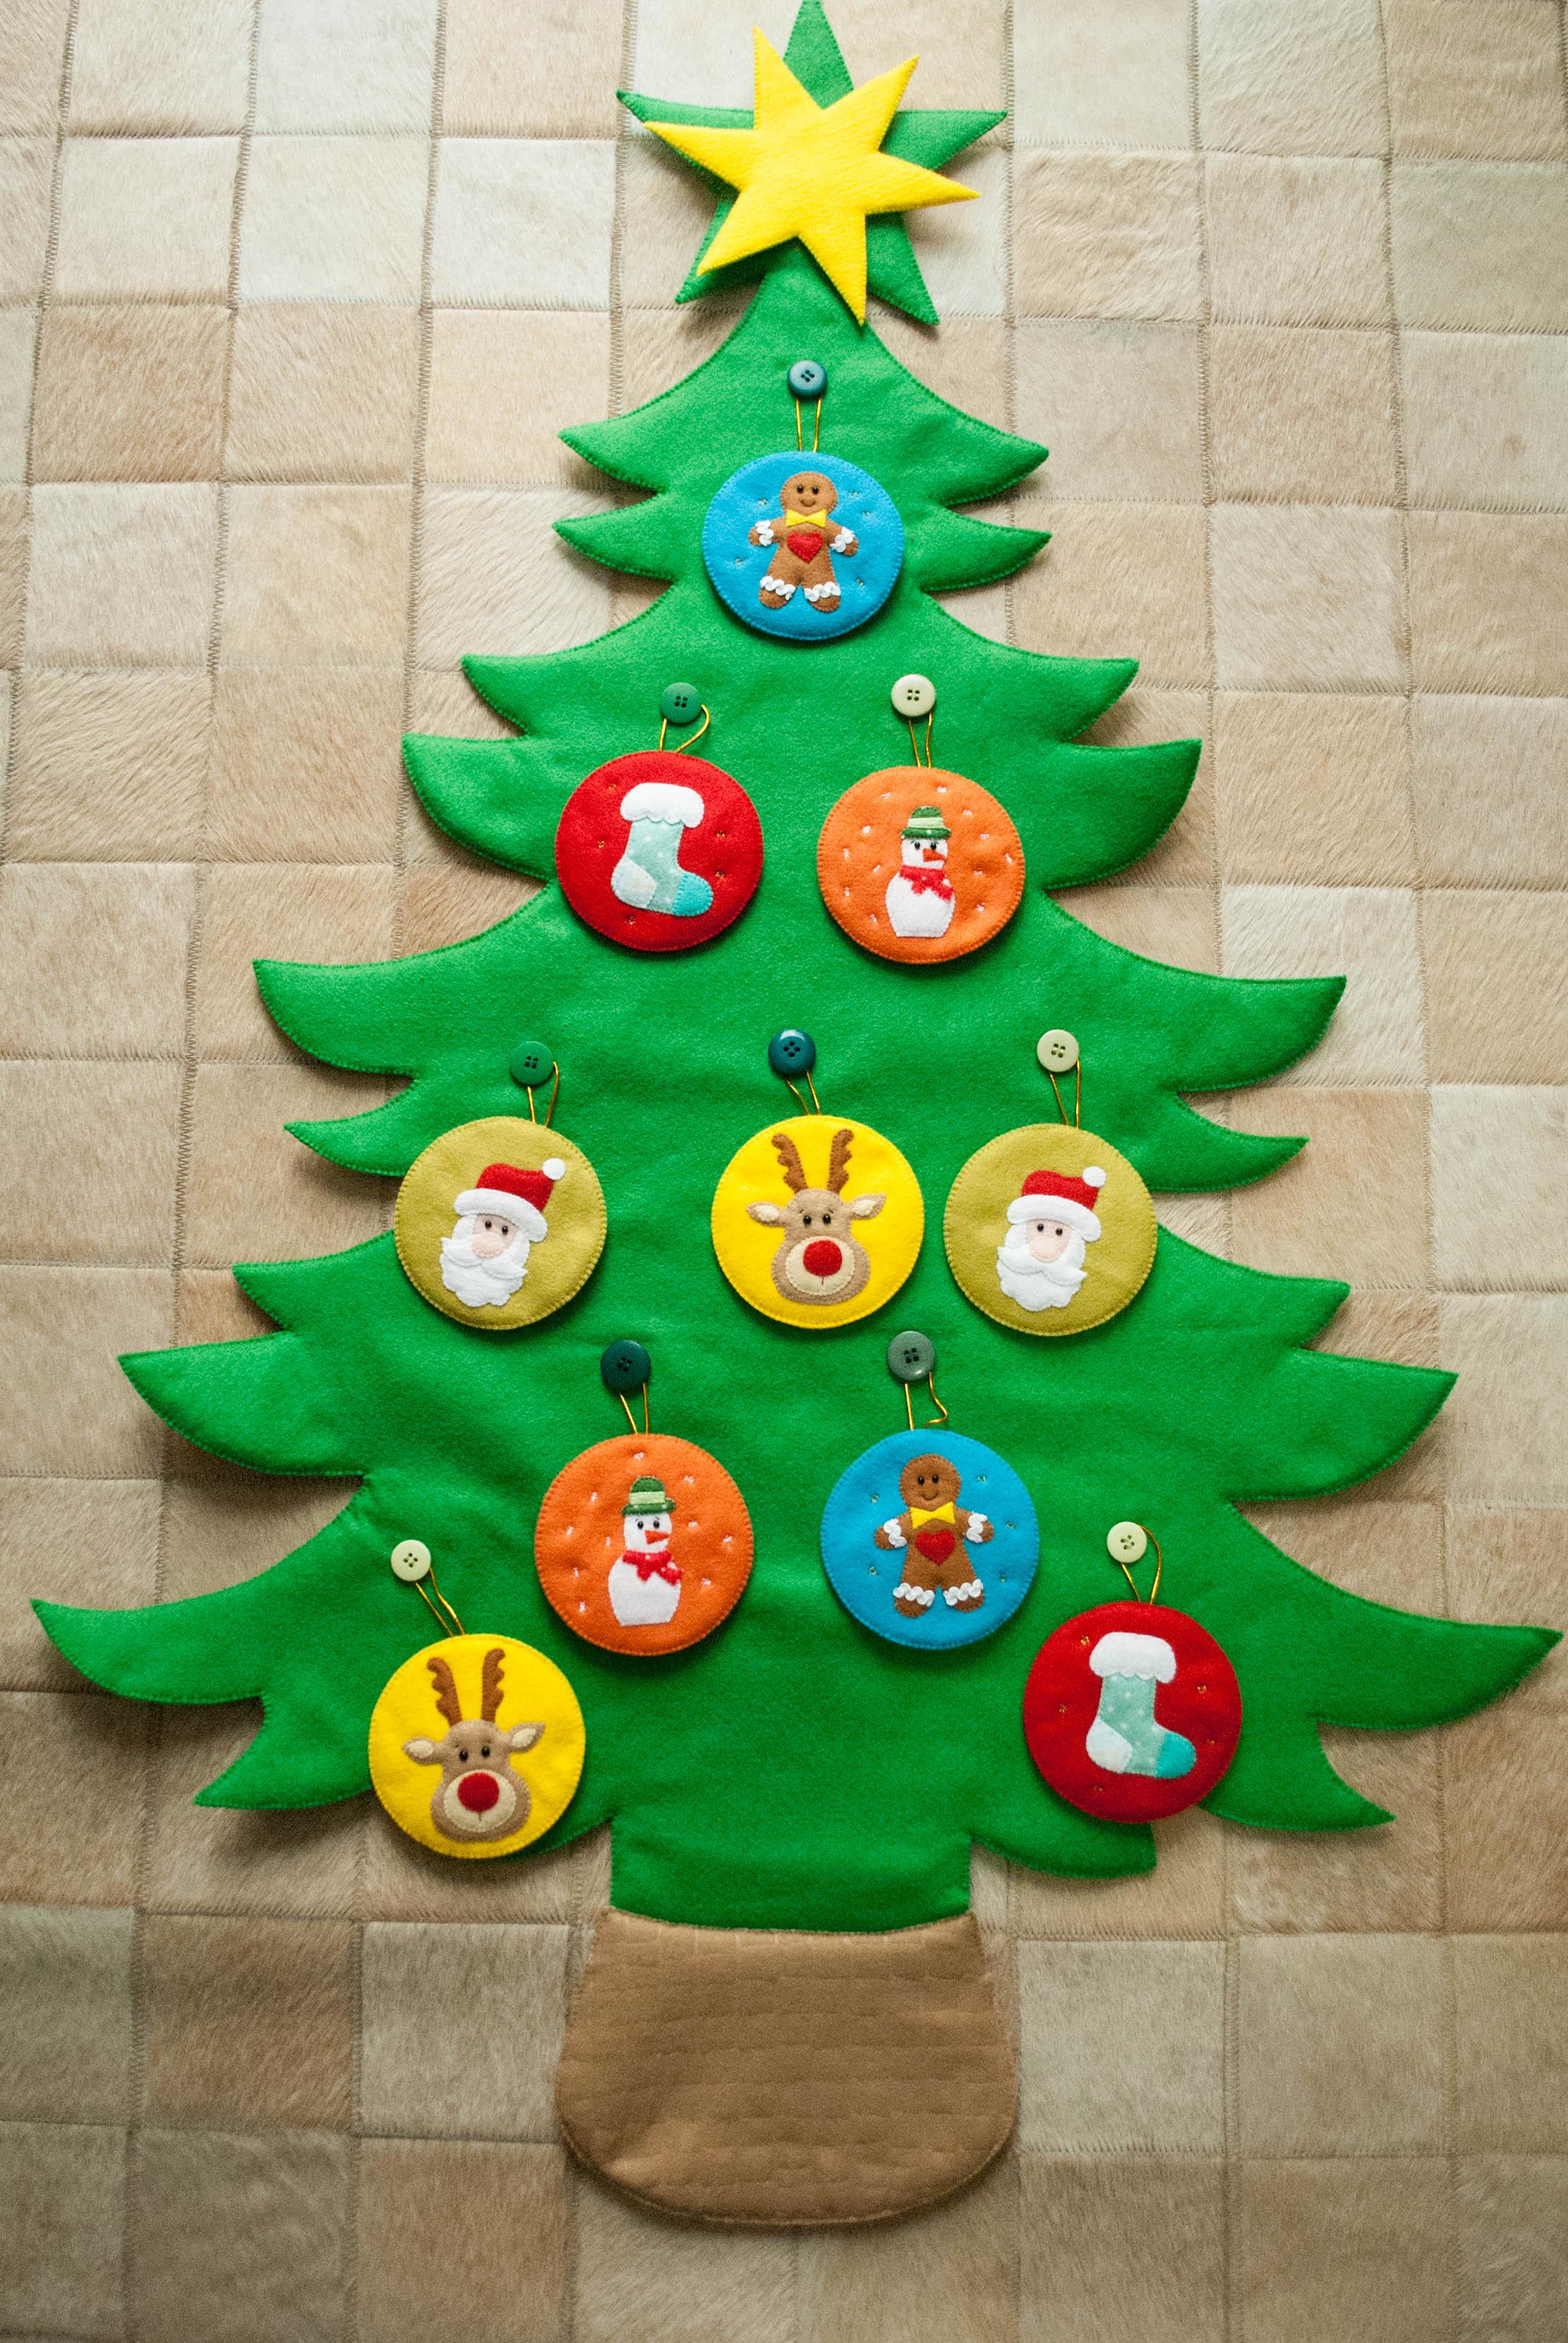 árvore De Natal Em Feltro No Elo7 Lauraline Atelier 8156c6